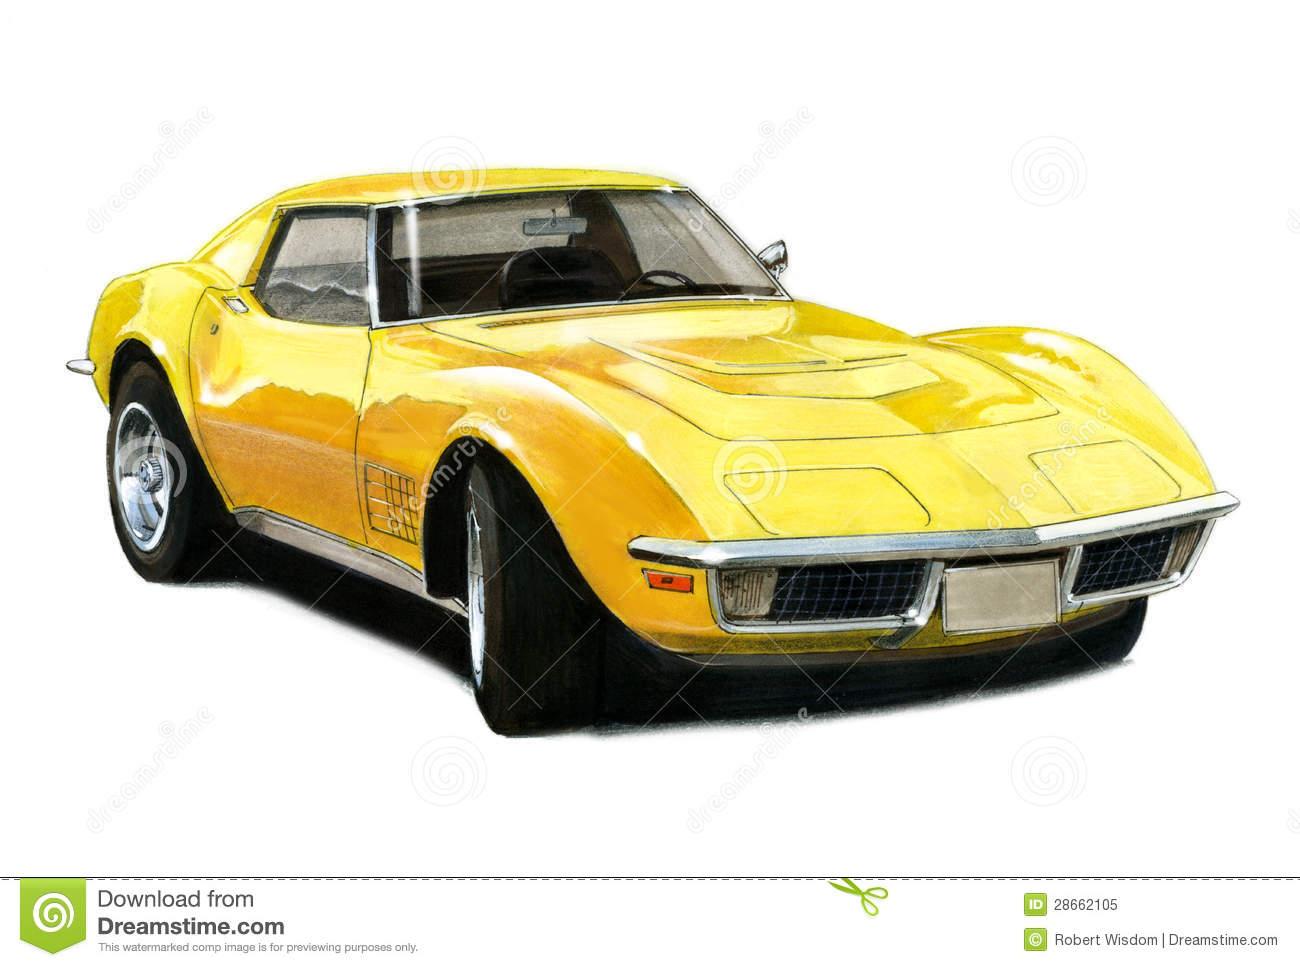 Chevrolet Stock Illustrations u2013 359 Chevrolet Stock Illustrations, Vectors  u0026 Clipart - Dreamstime